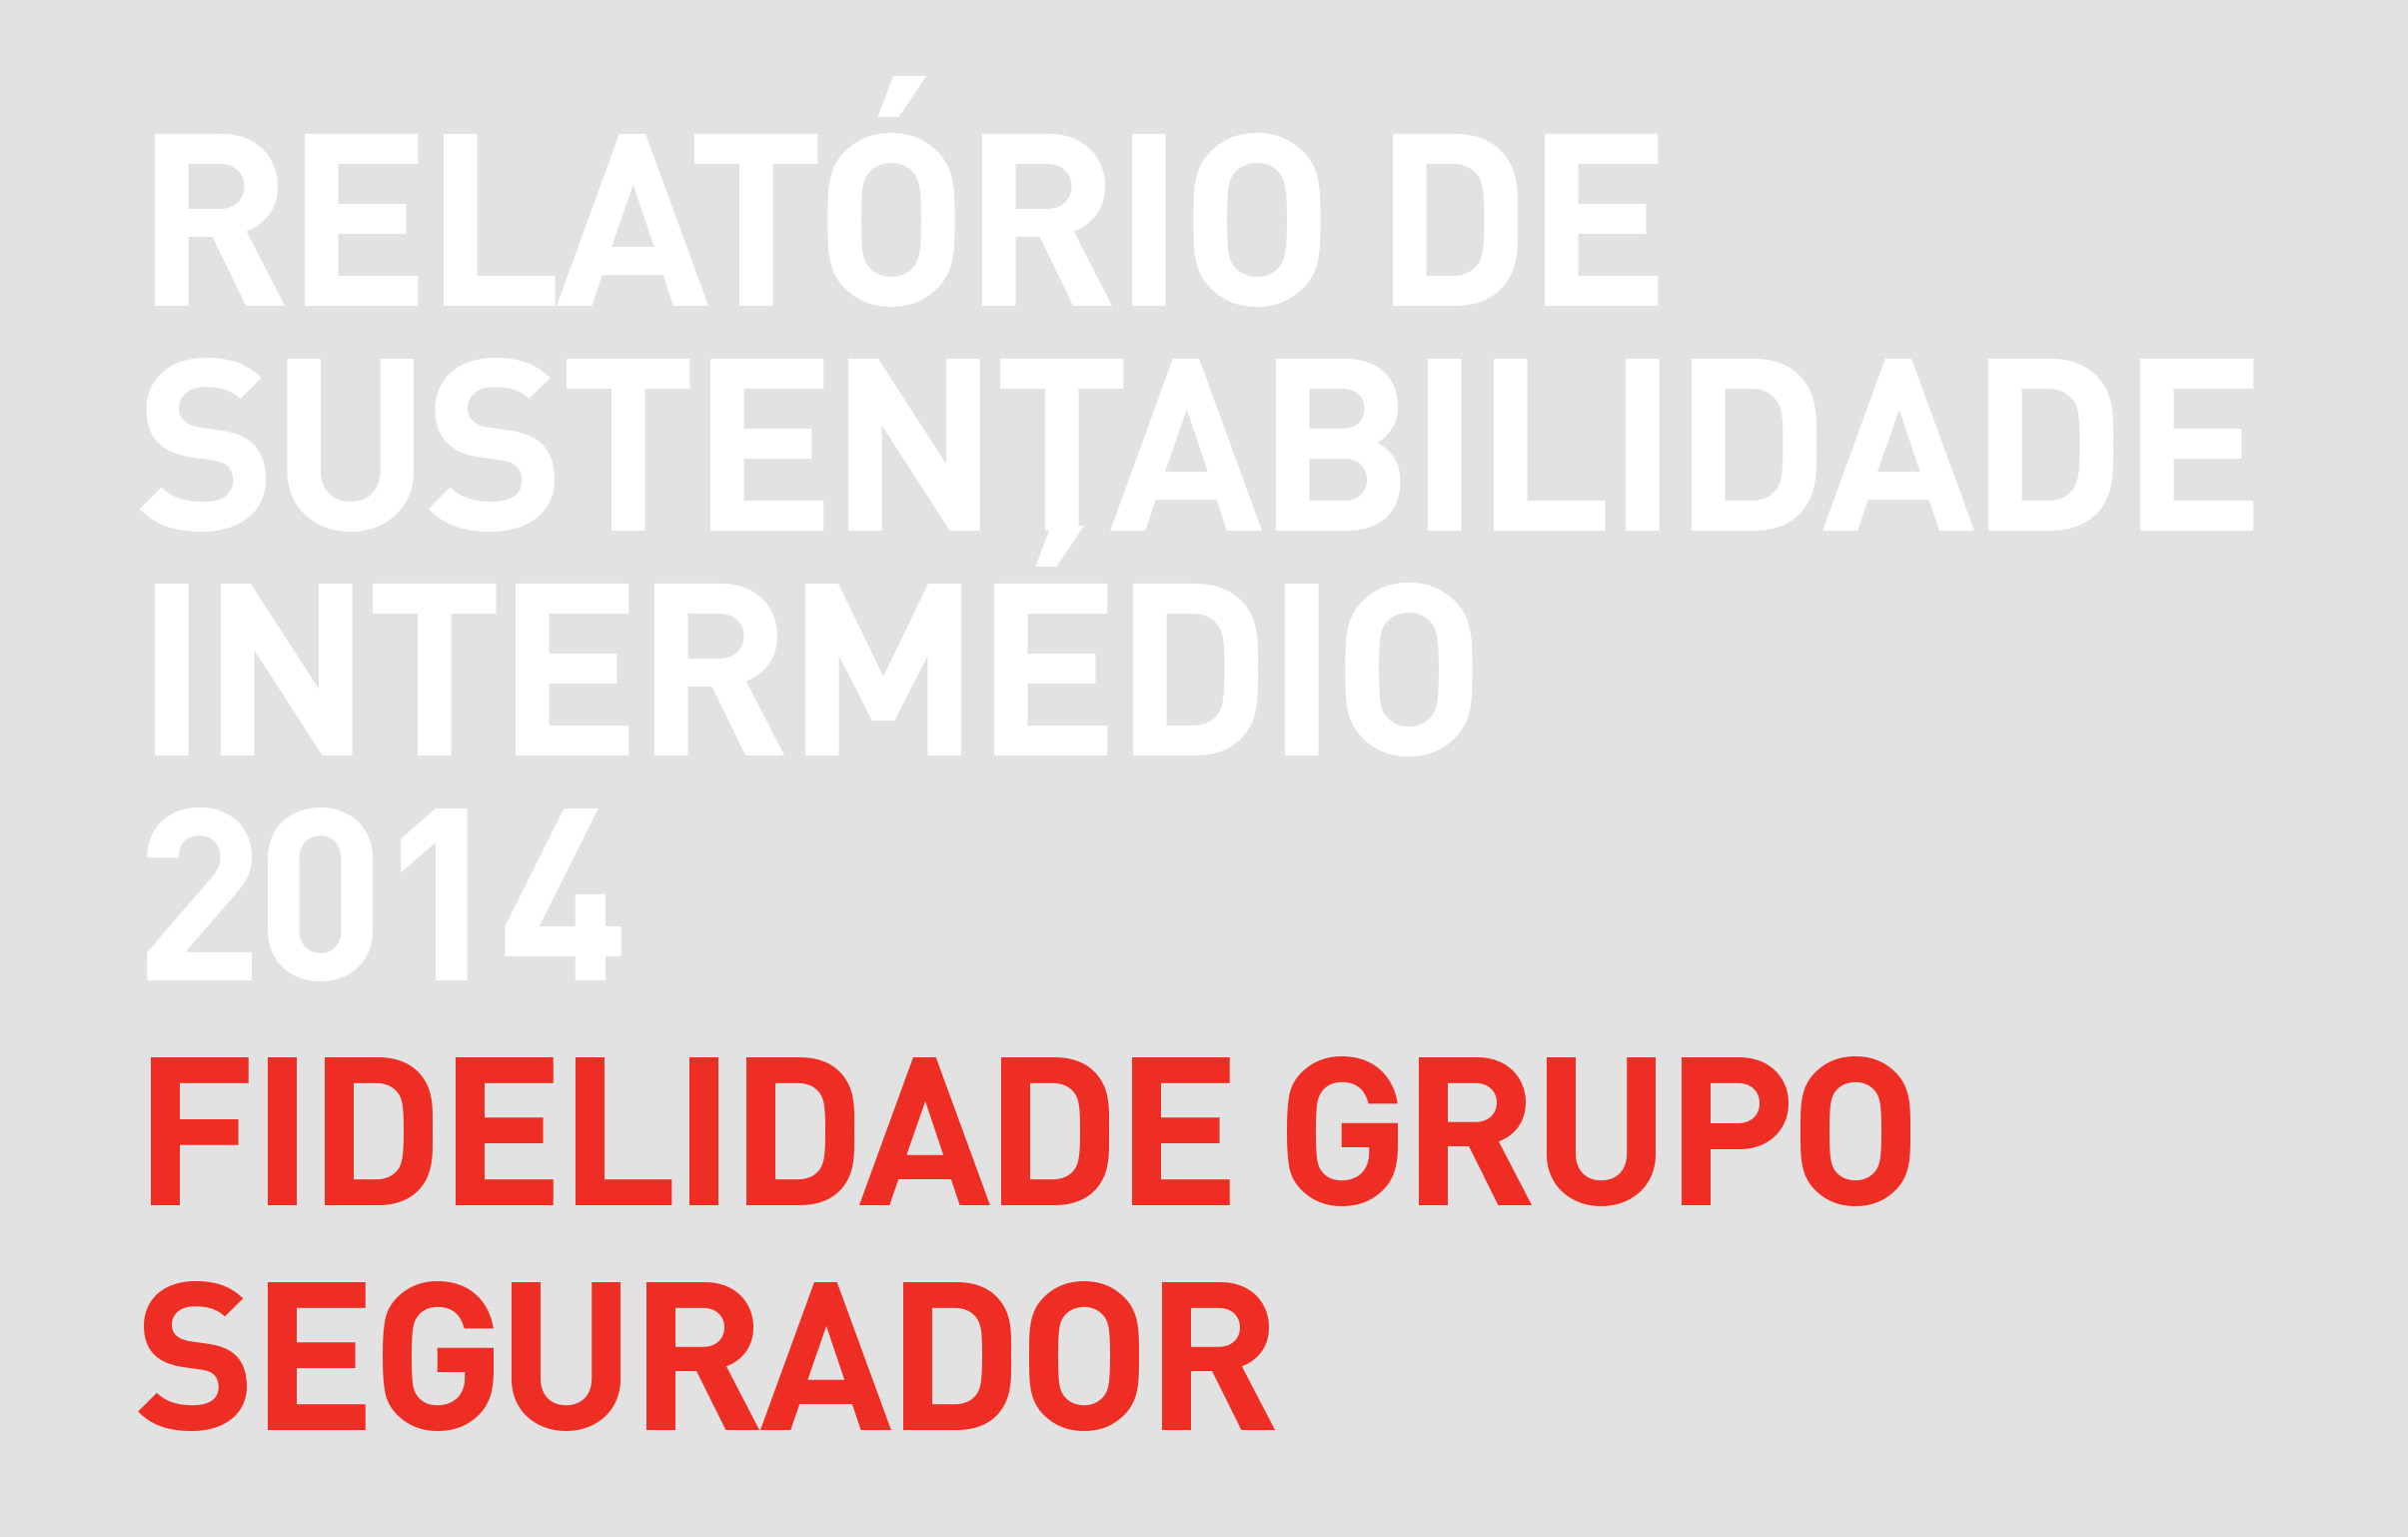 fidelidade_intermedio_2014